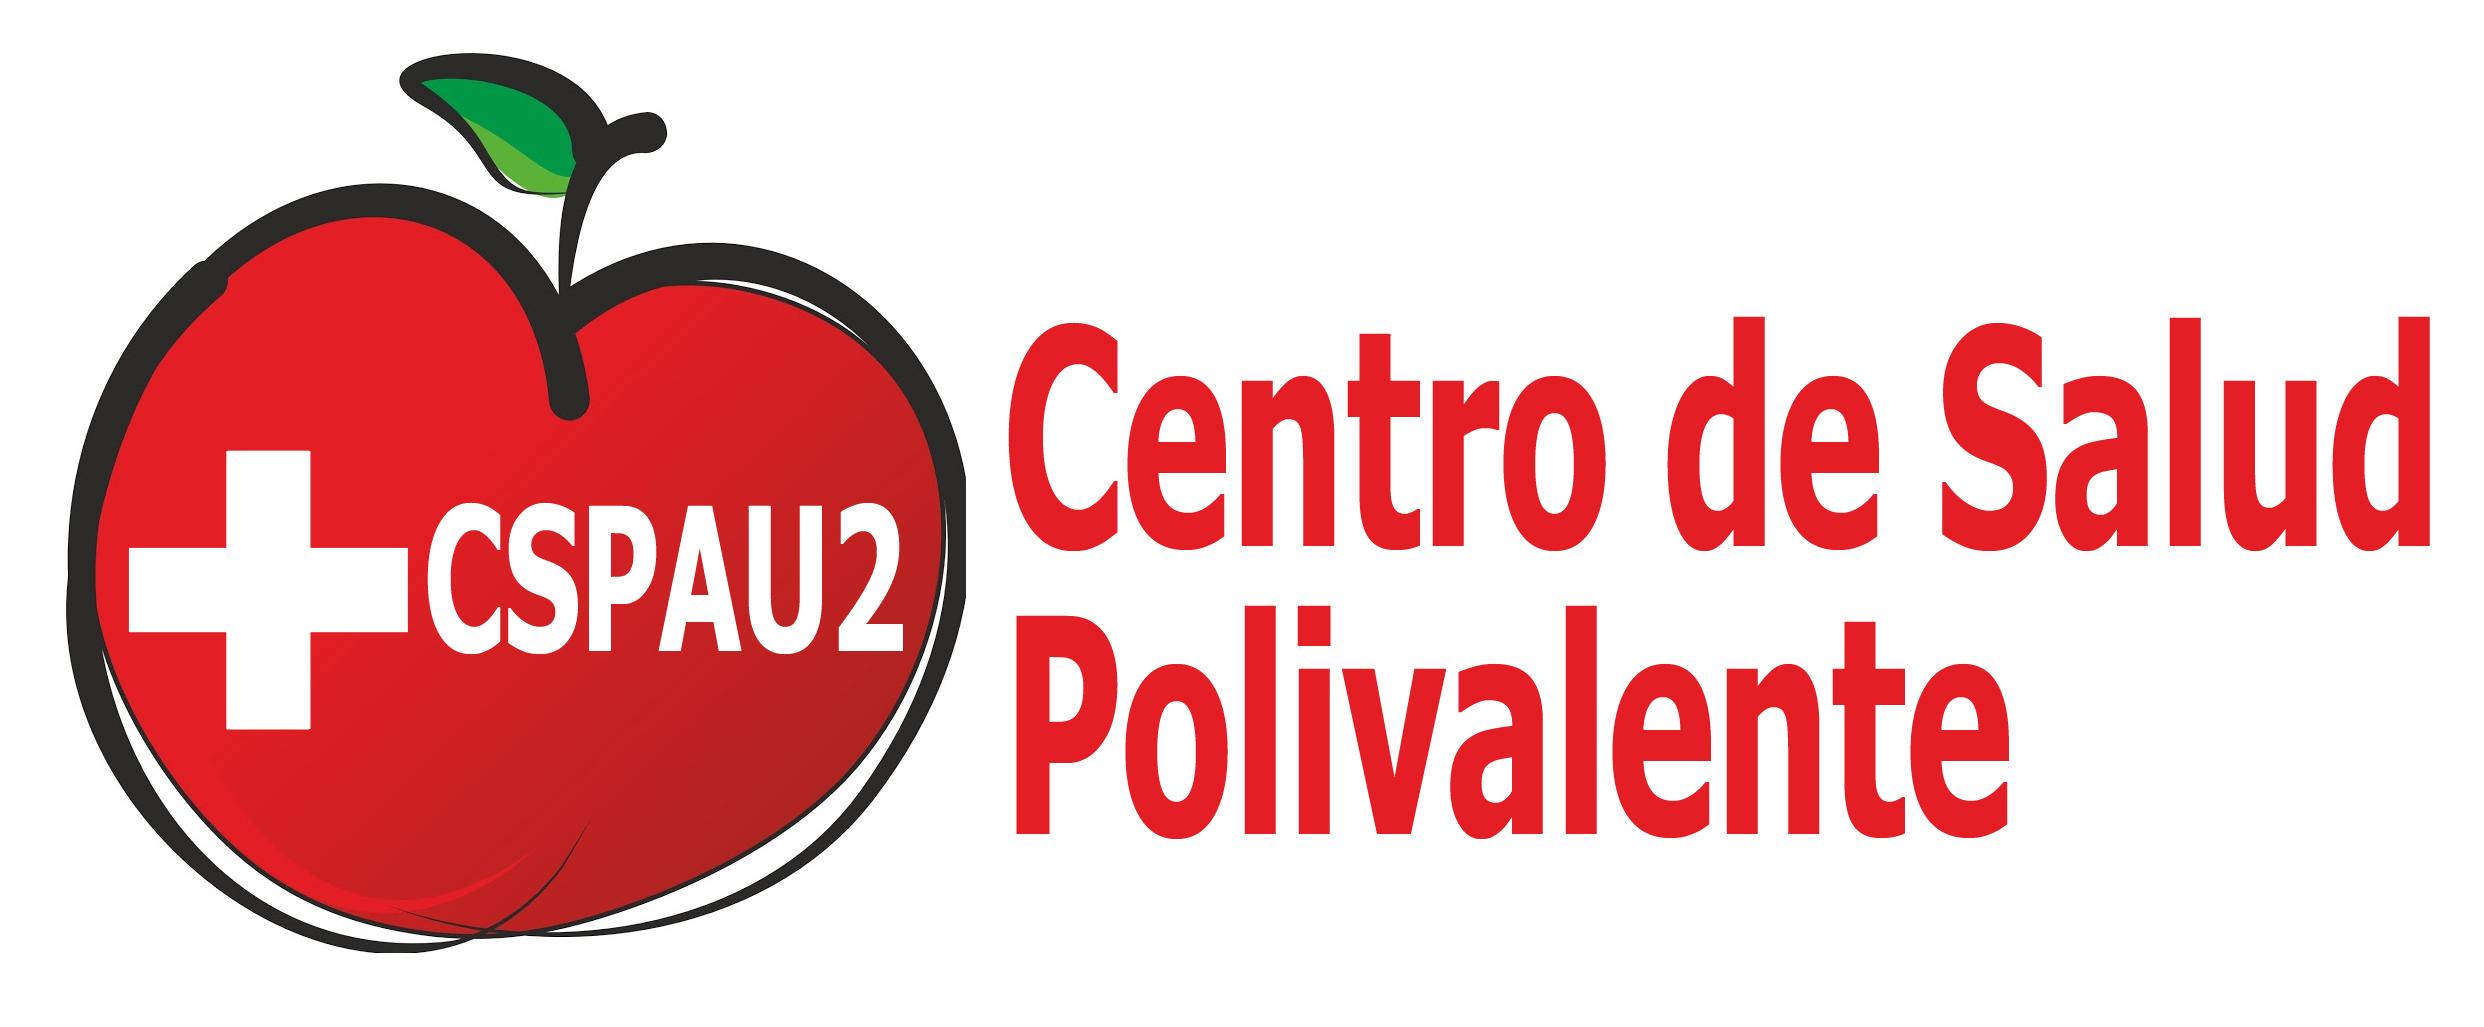 cspau2 logo